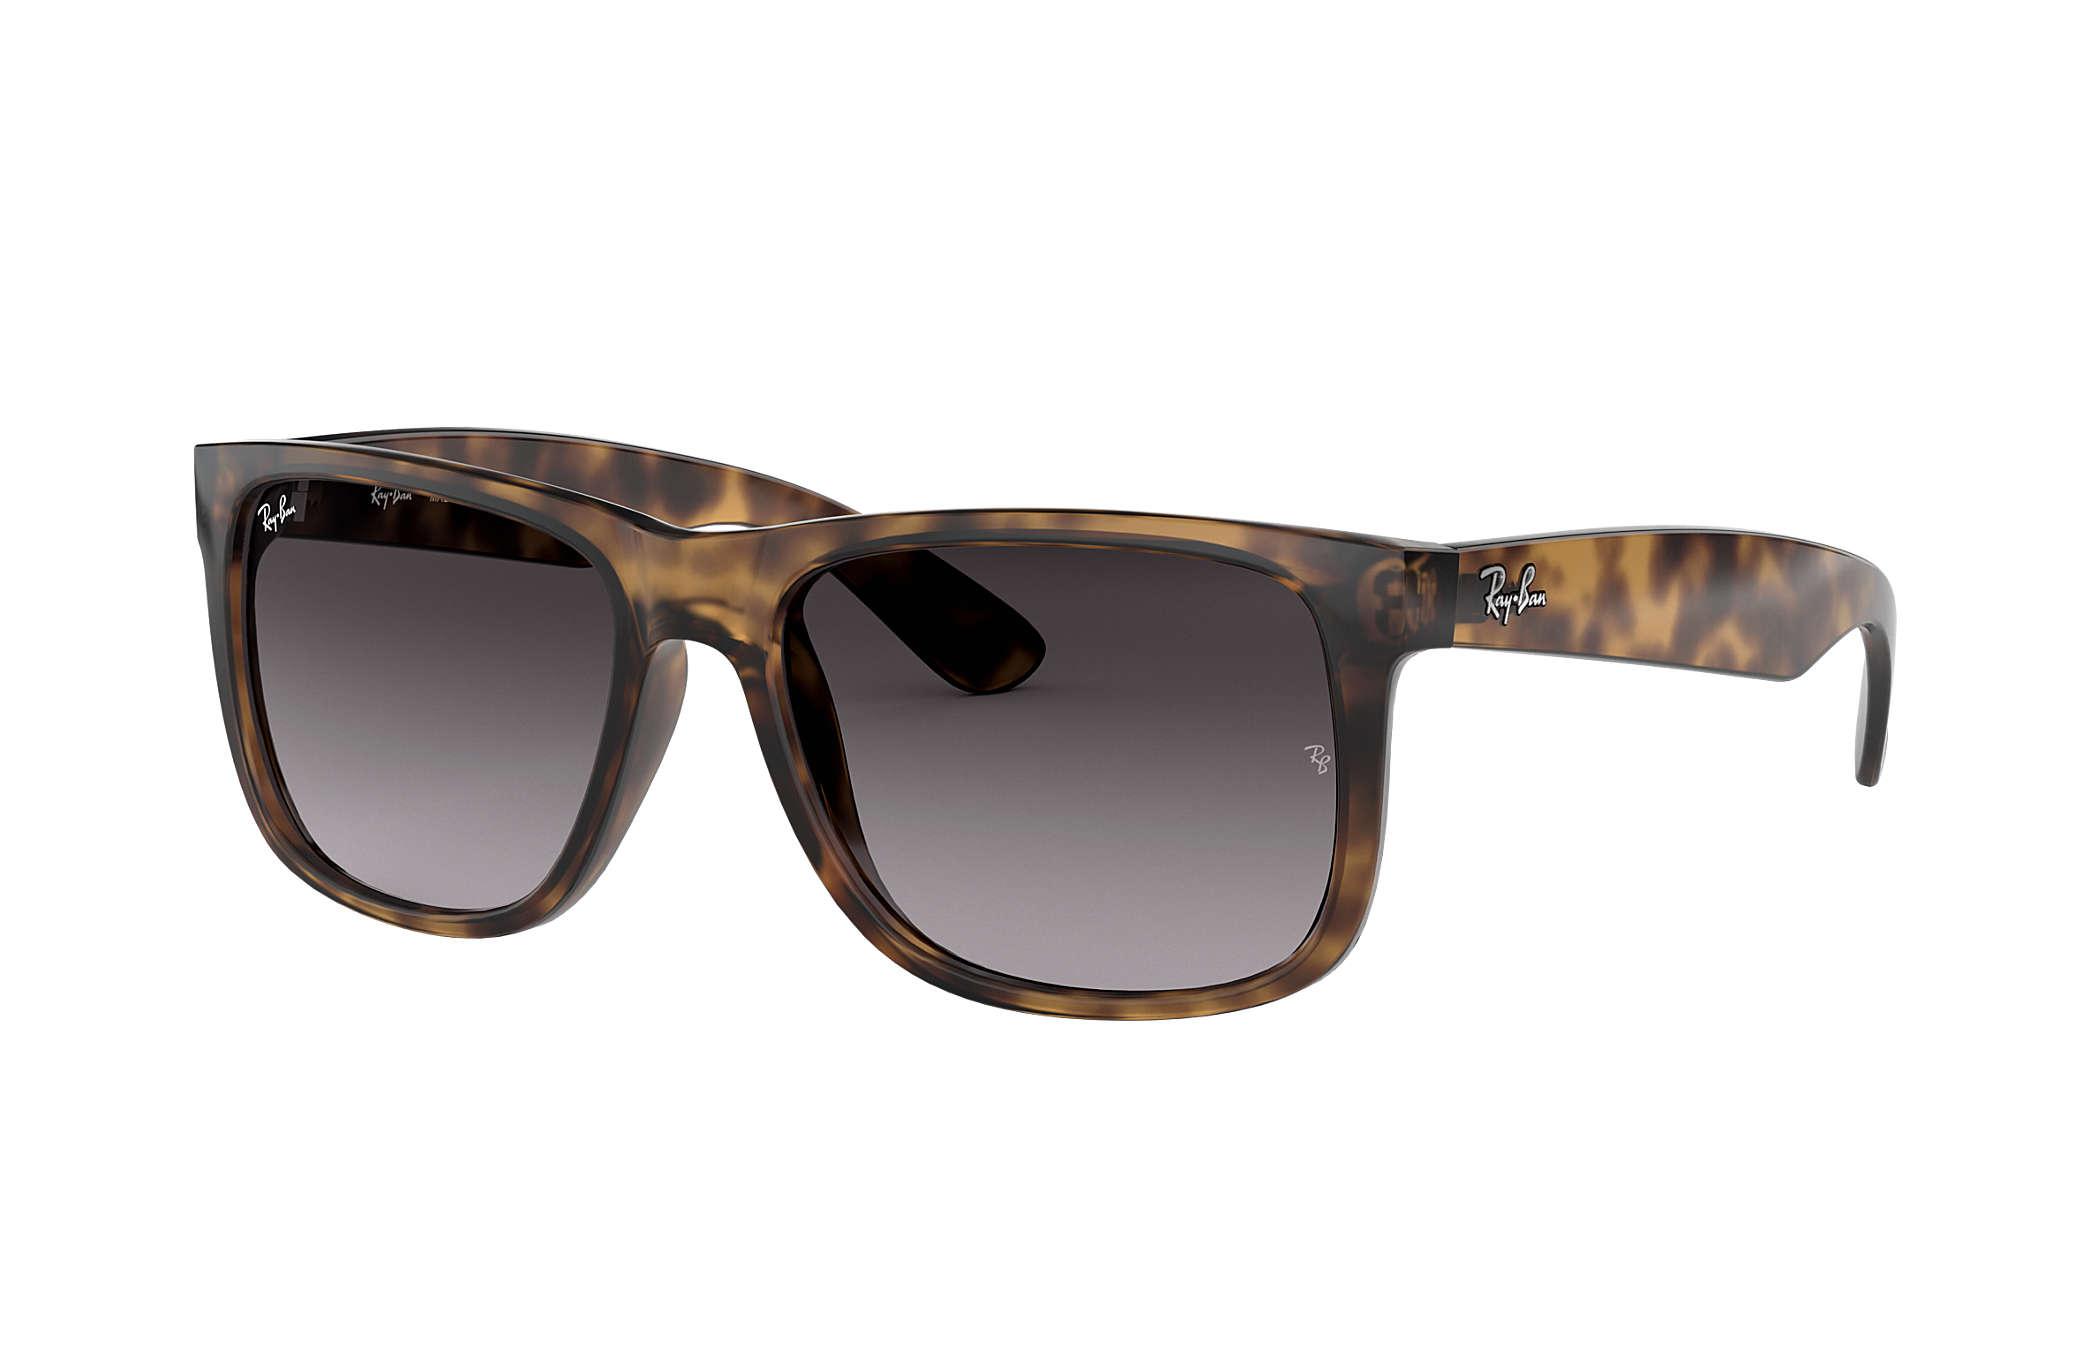 c5125dead9 Ray-Ban Justin Classic RB4165F Tortoise - Nylon - Grey Lenses ...